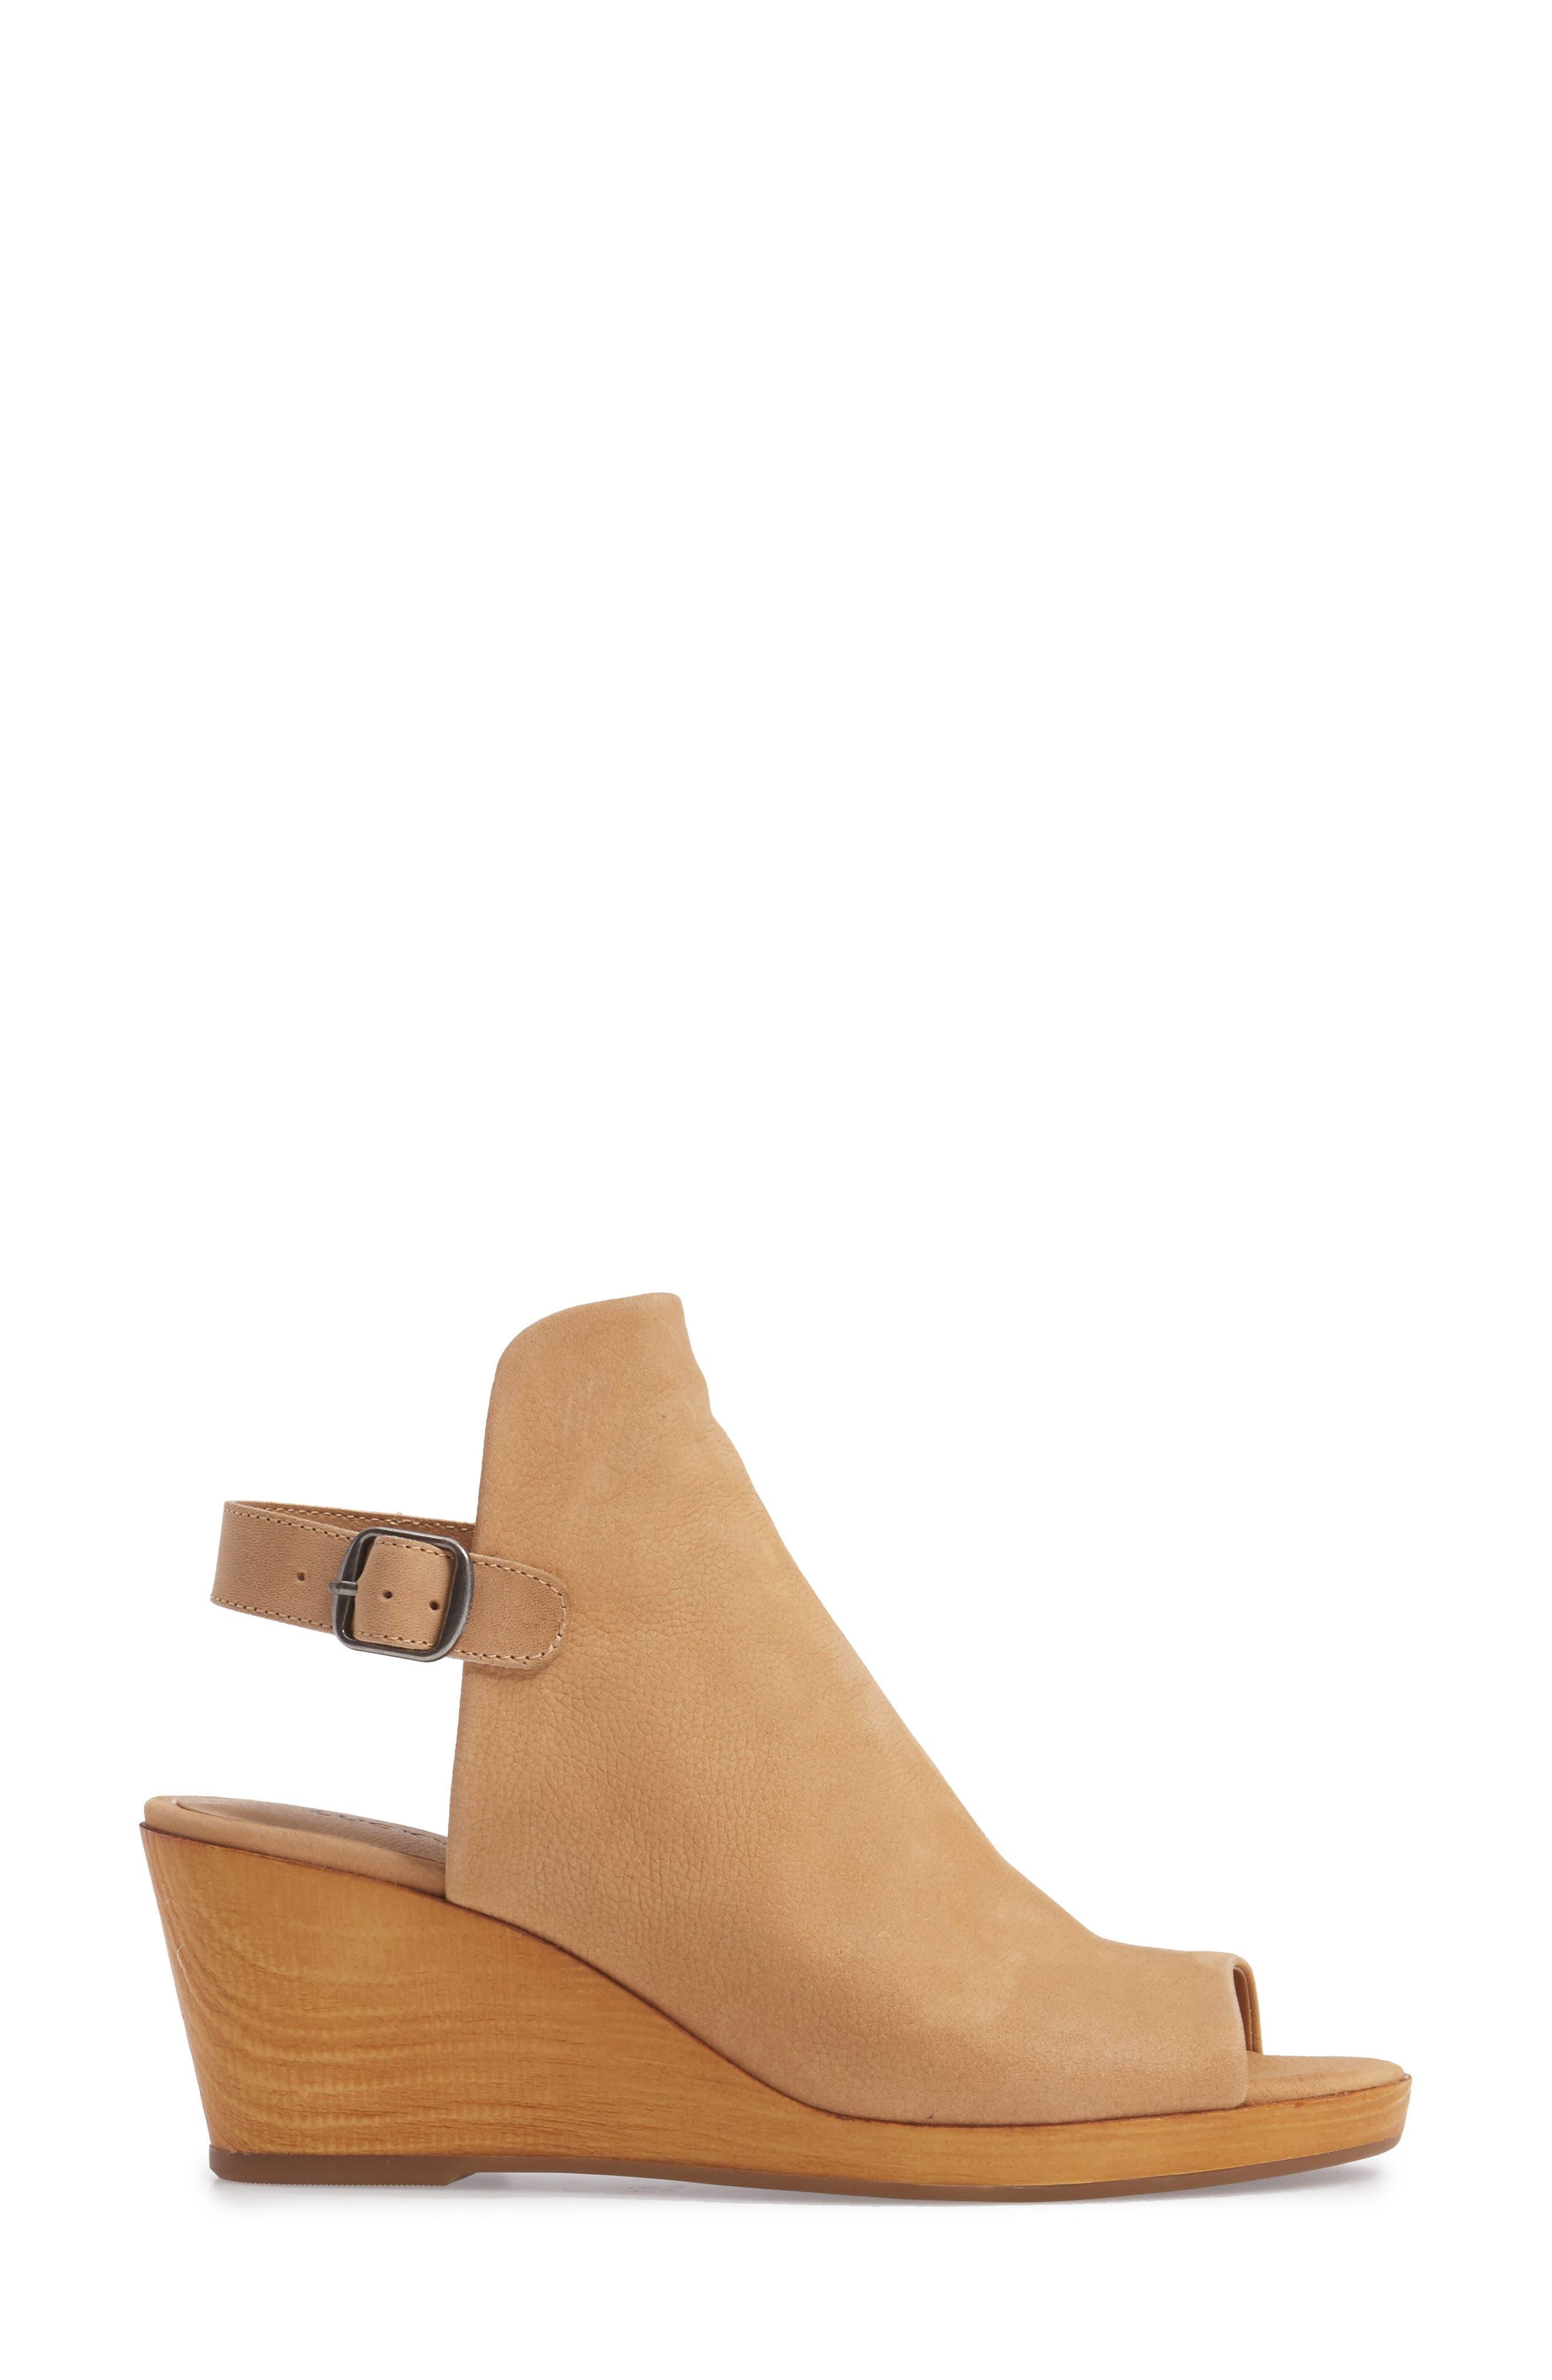 Keralin Wedge Sandal,                             Alternate thumbnail 3, color,                             Glazed Leather